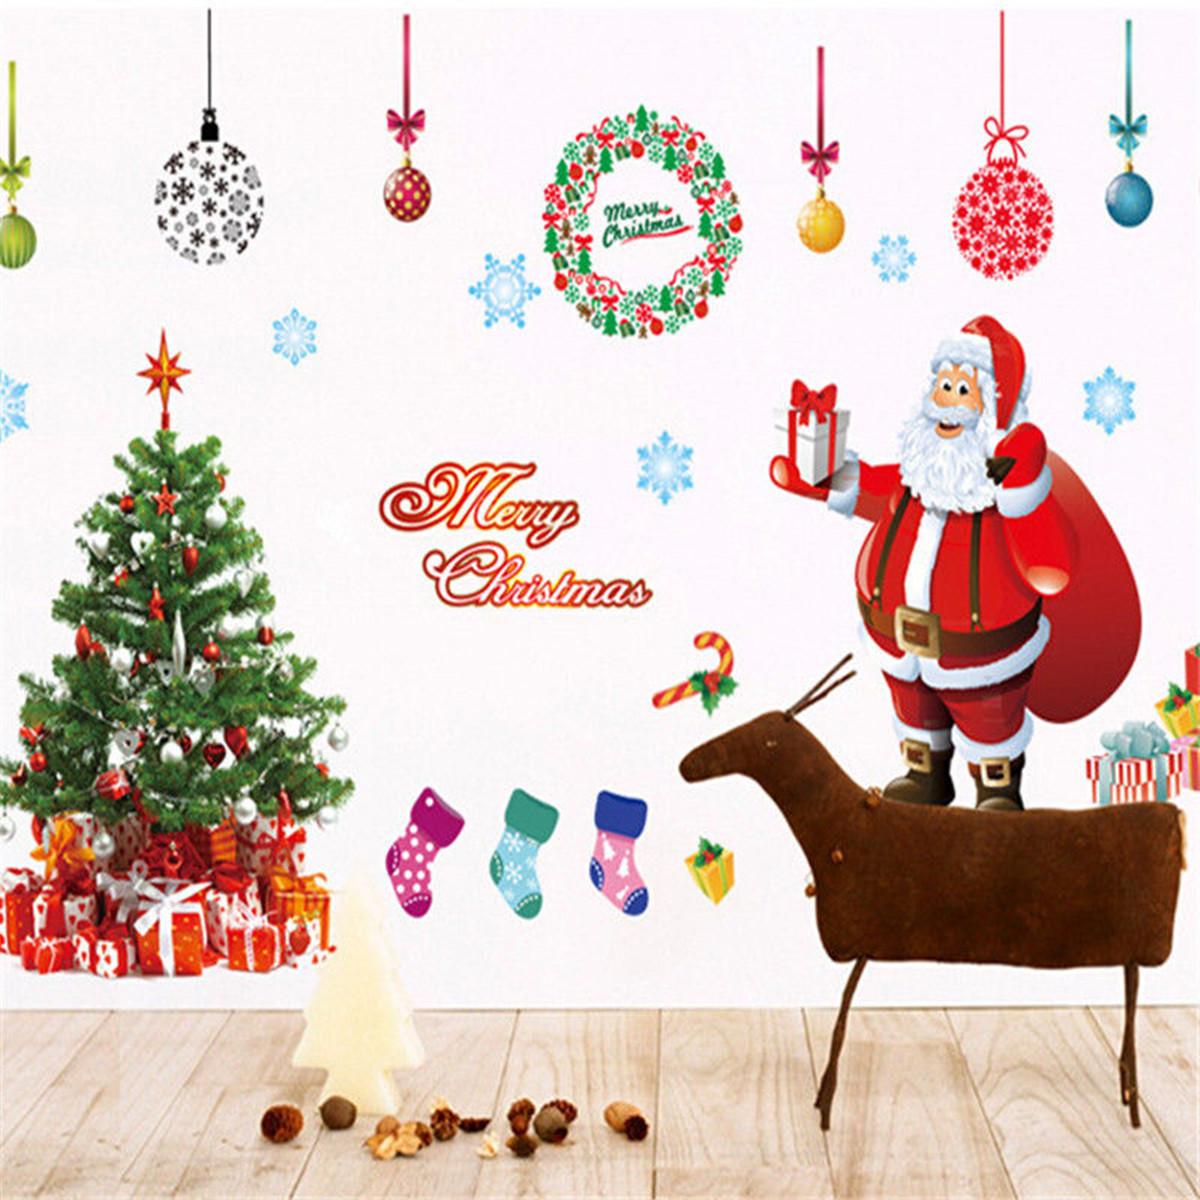 Christmas Tree Wall Sticker Santa Claus Gift Wall Art Window Home